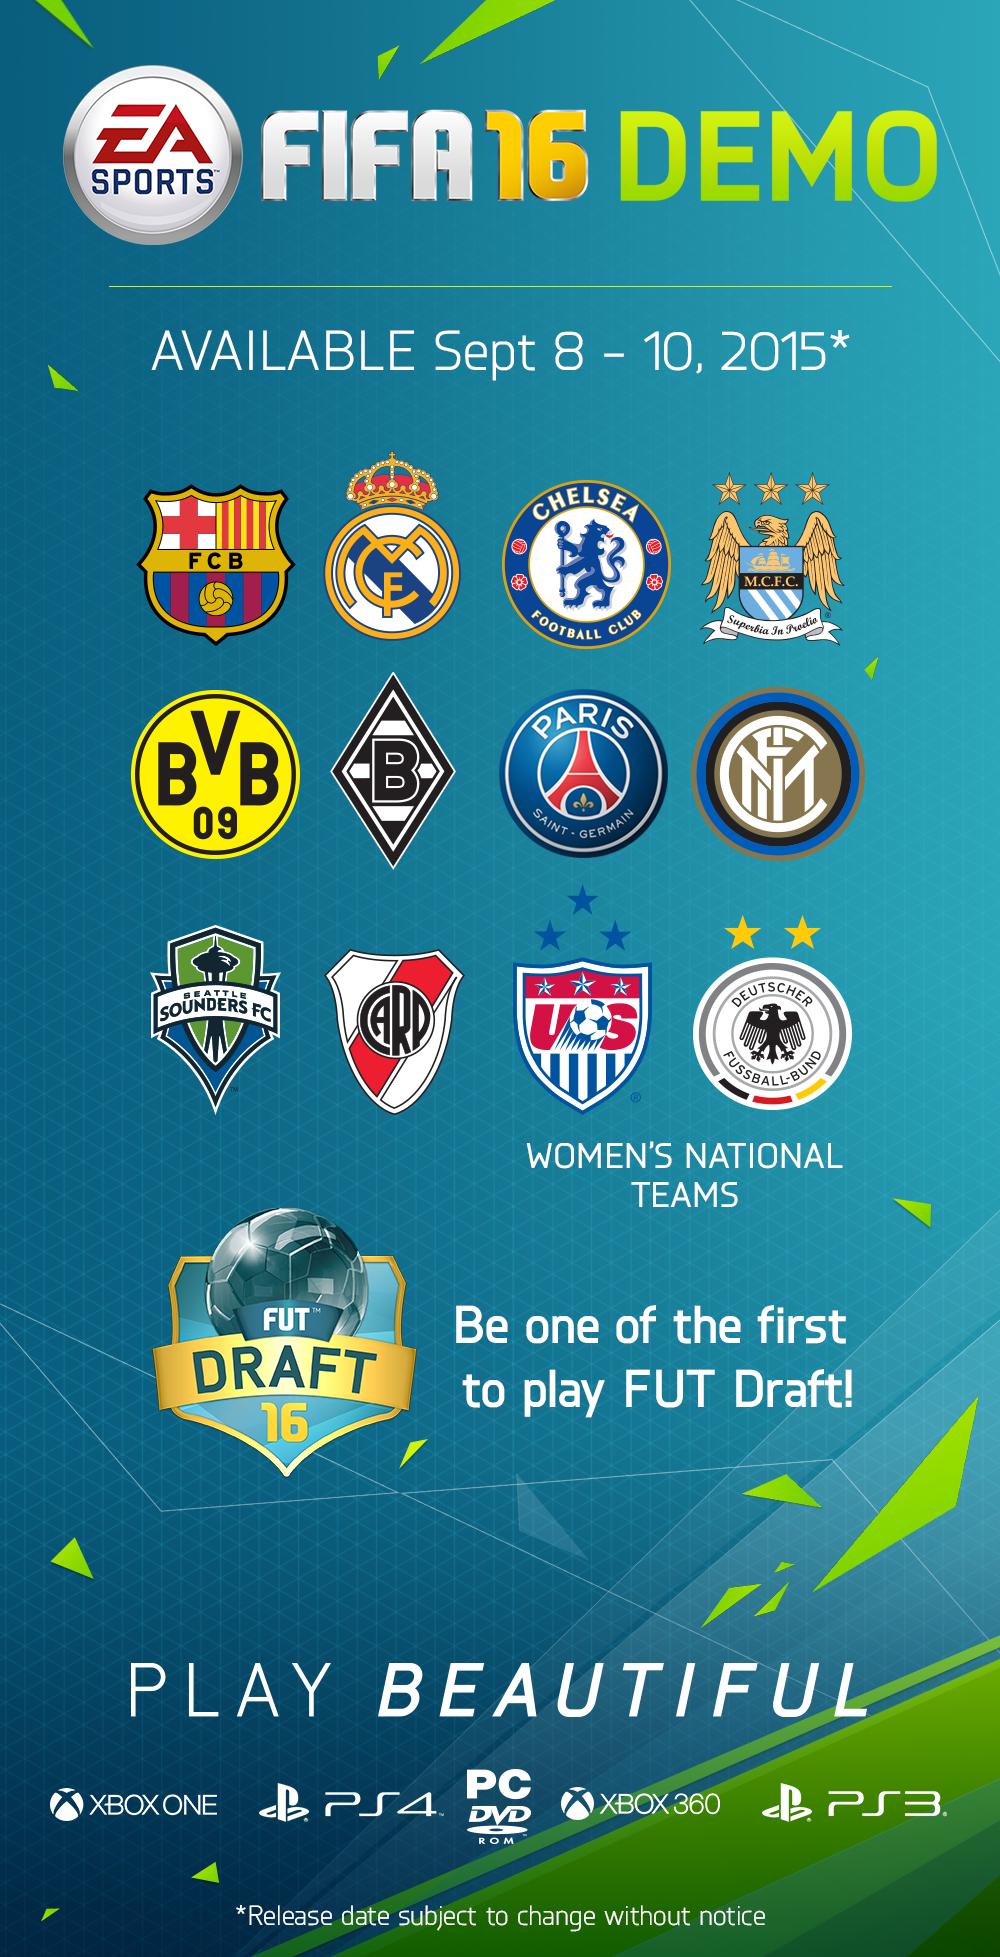 20150817_FIFA16_DemoClubs_Announce_SkyScraper_1000x1957.png